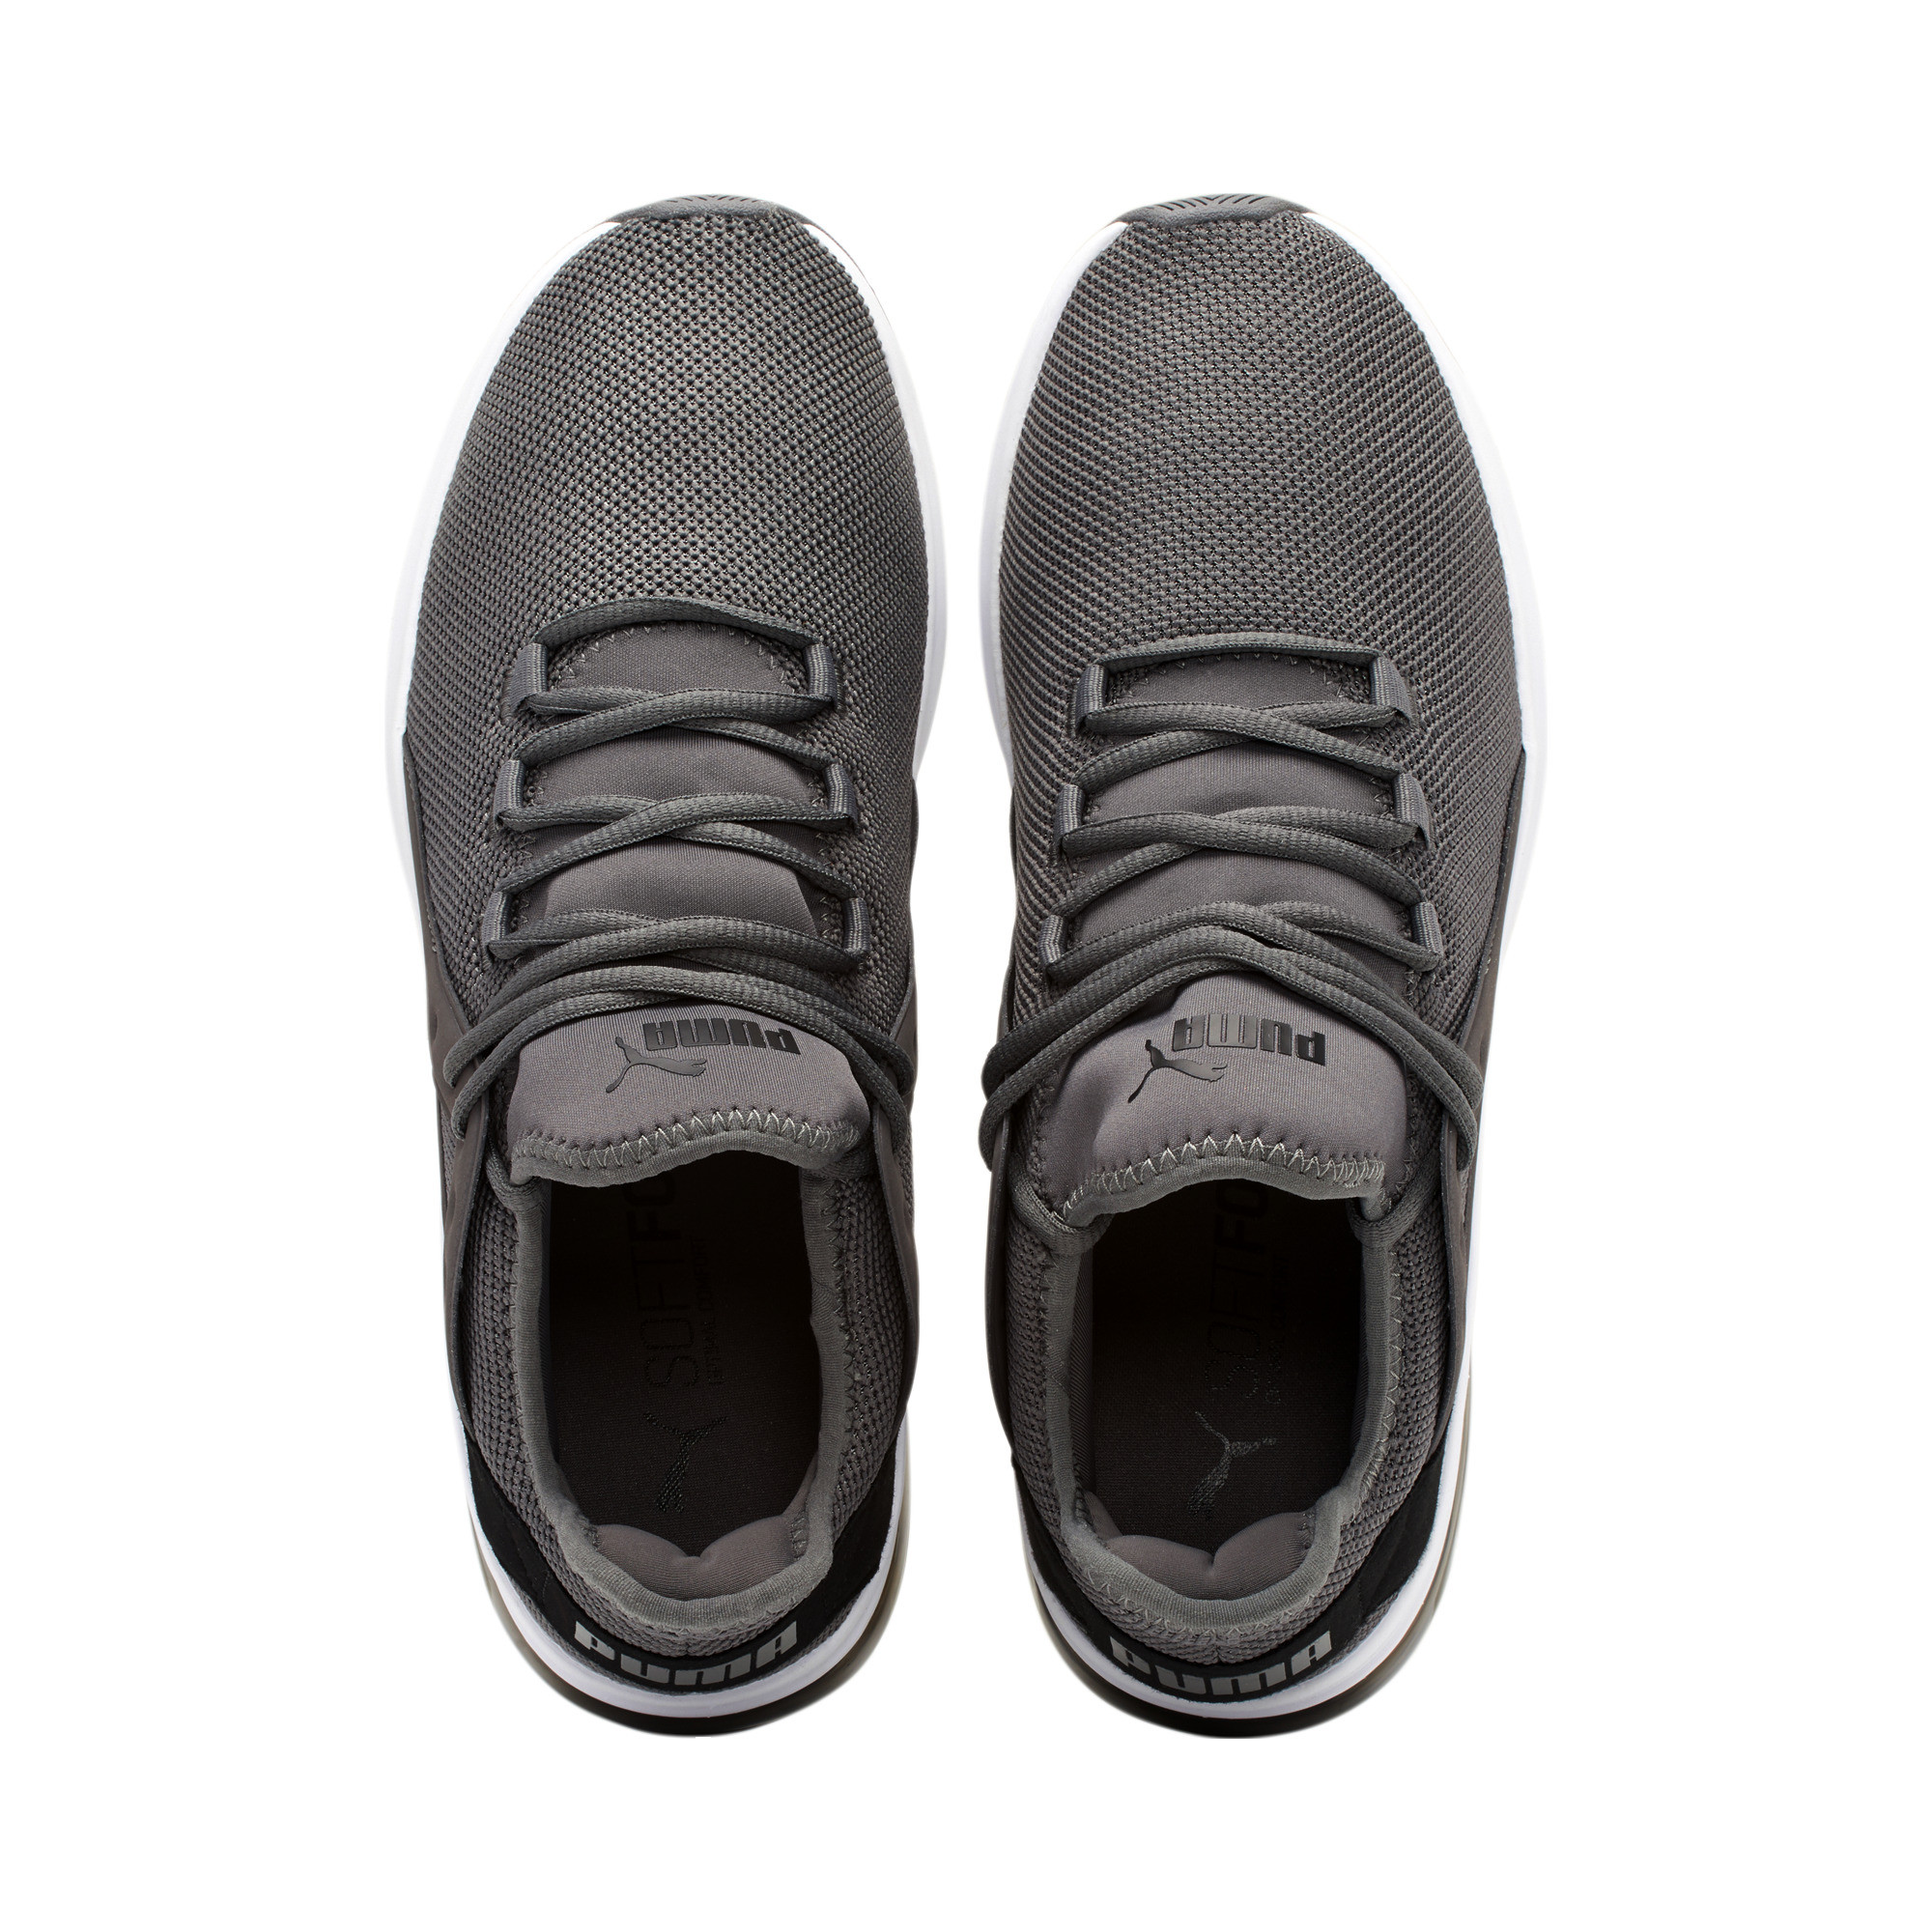 PUMA-Men-039-s-Electron-Street-Sneakers thumbnail 20